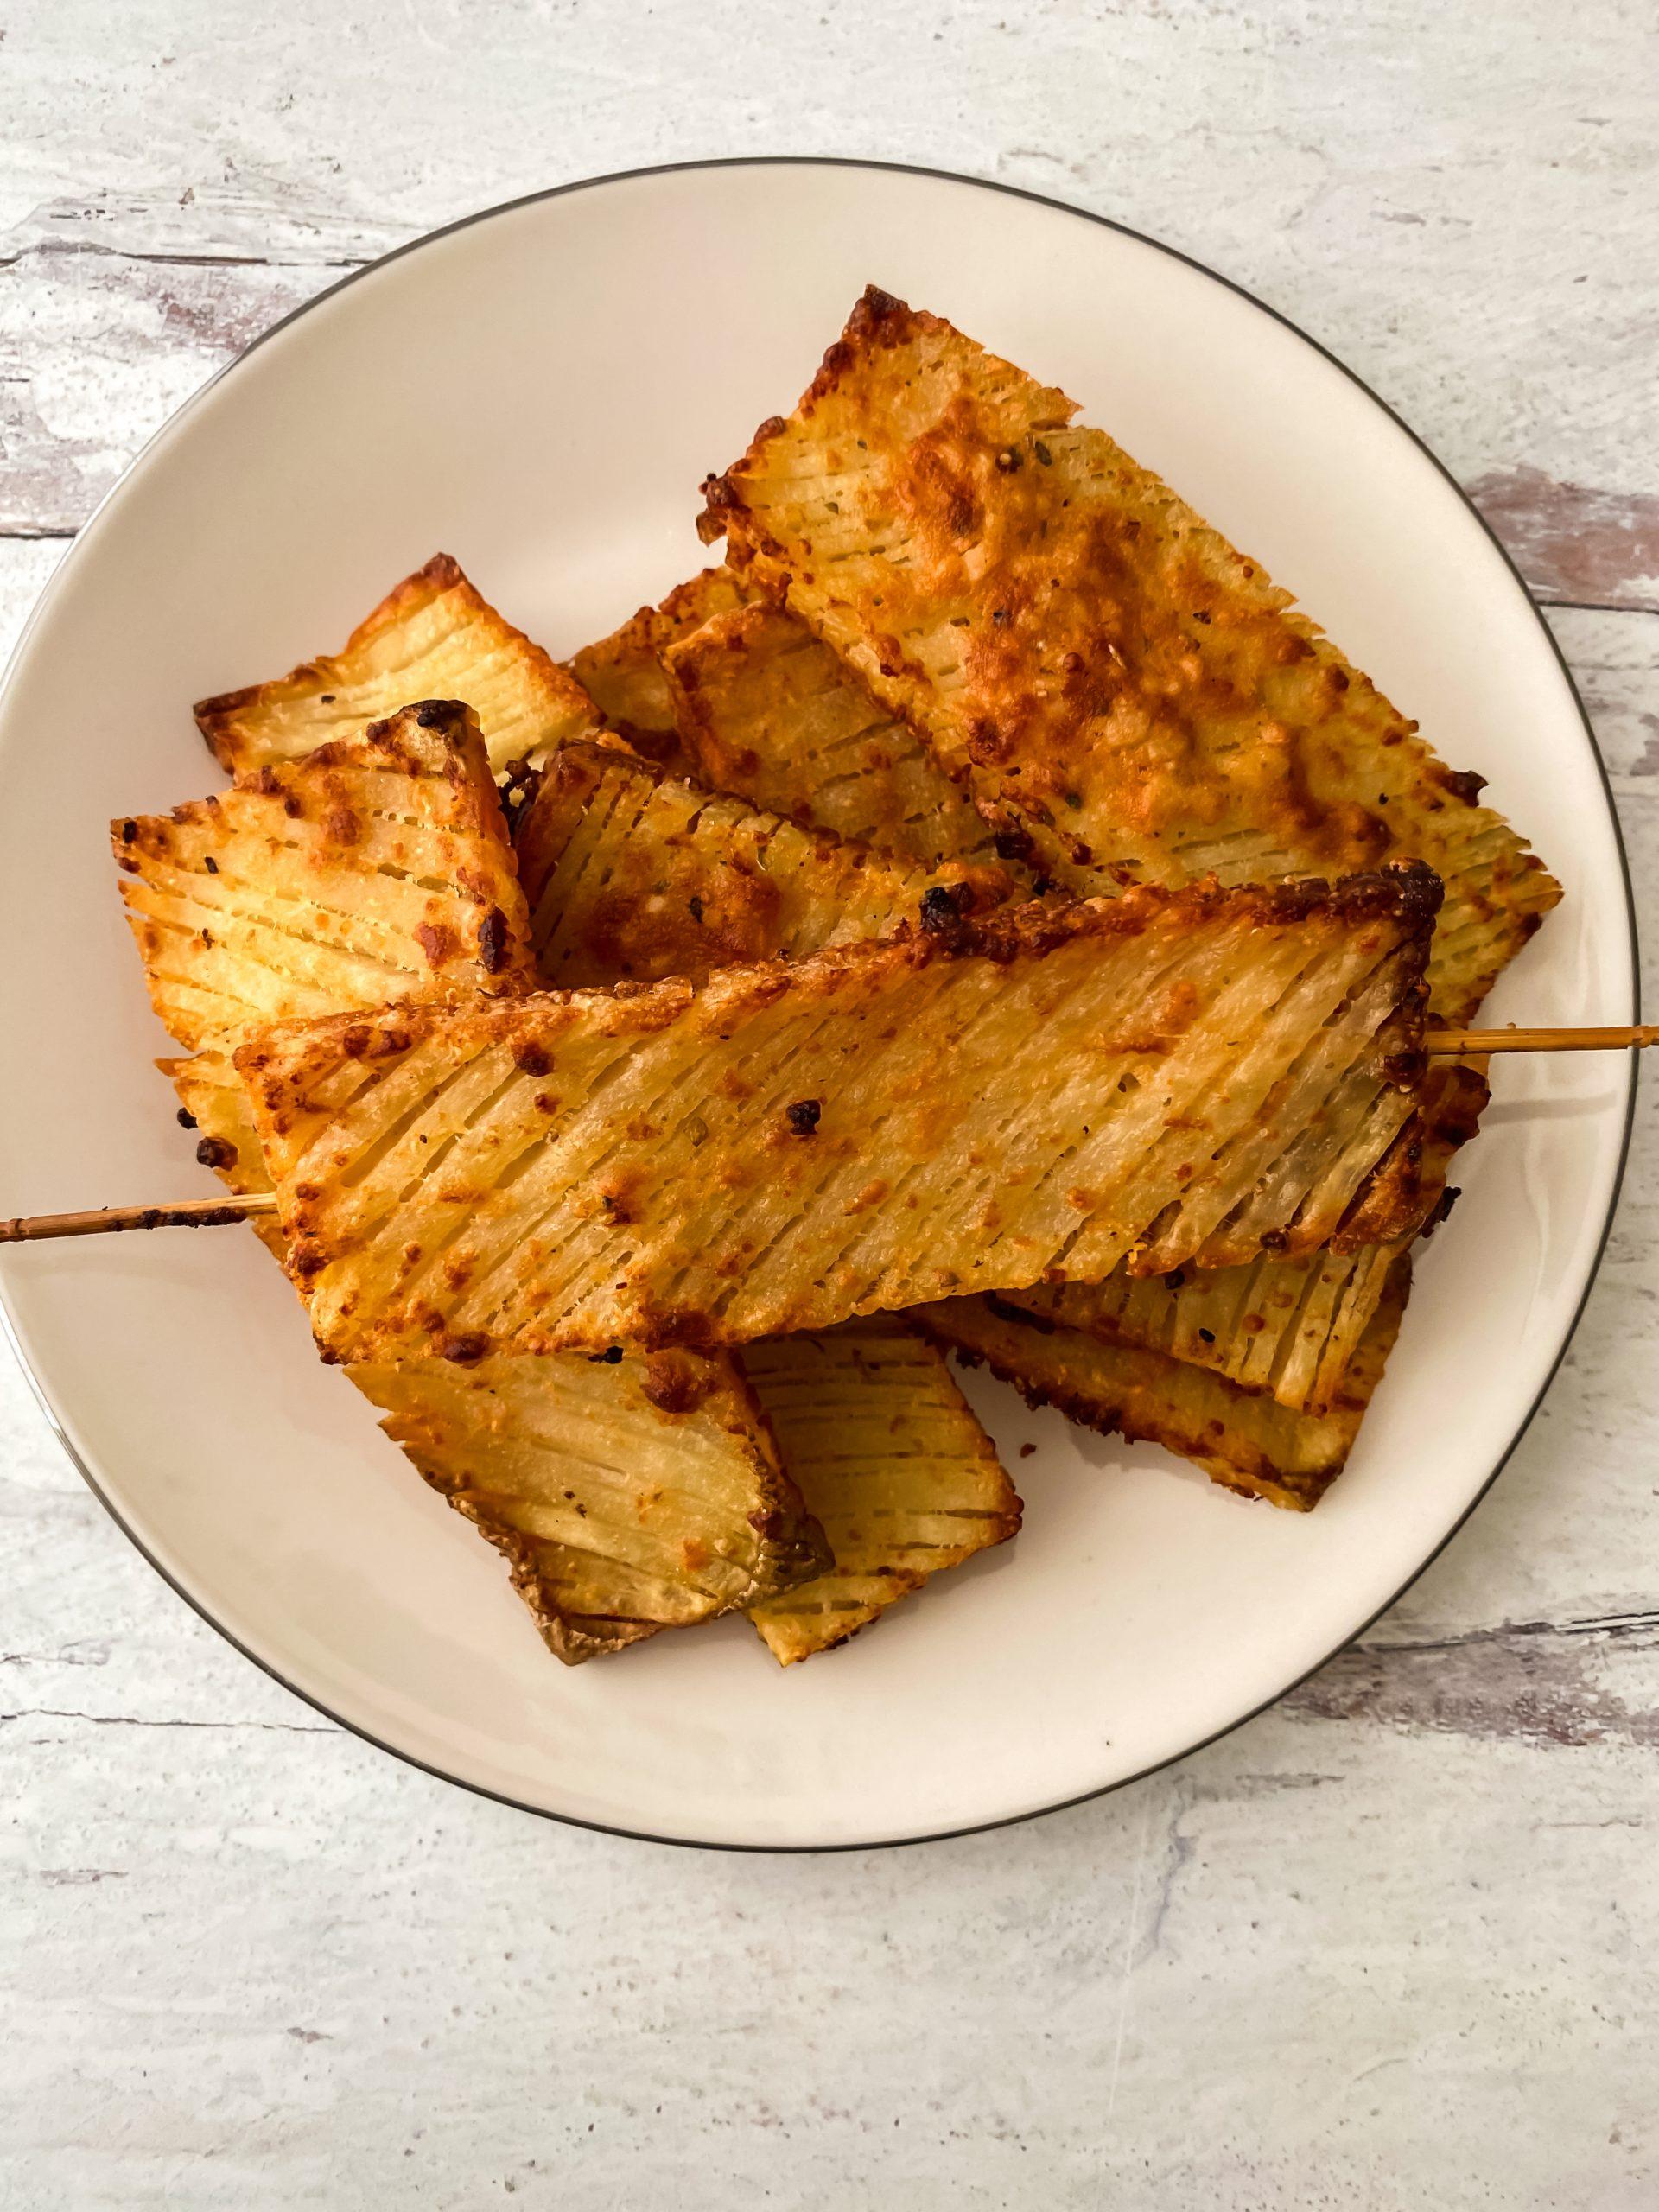 garlic parmesan hasselback waffle potatoes served on white plate